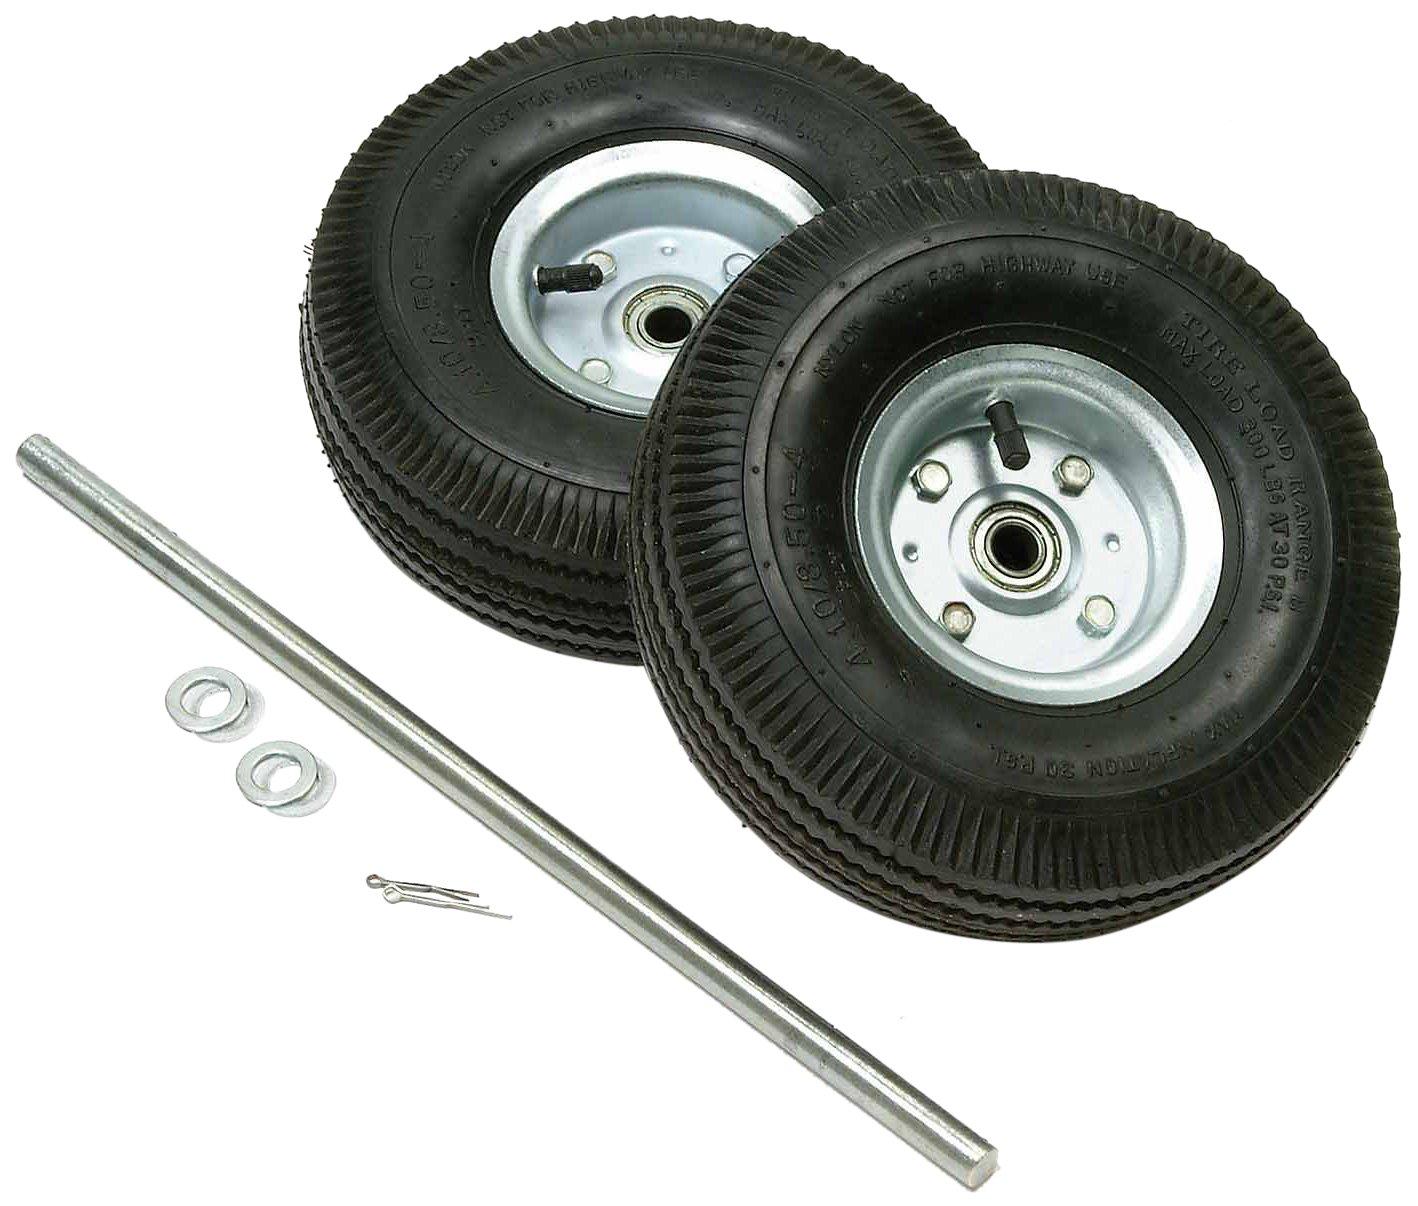 Nexel CA10HTN 10'' Pneumatic Wheels and Axle Kit (Set of 2),